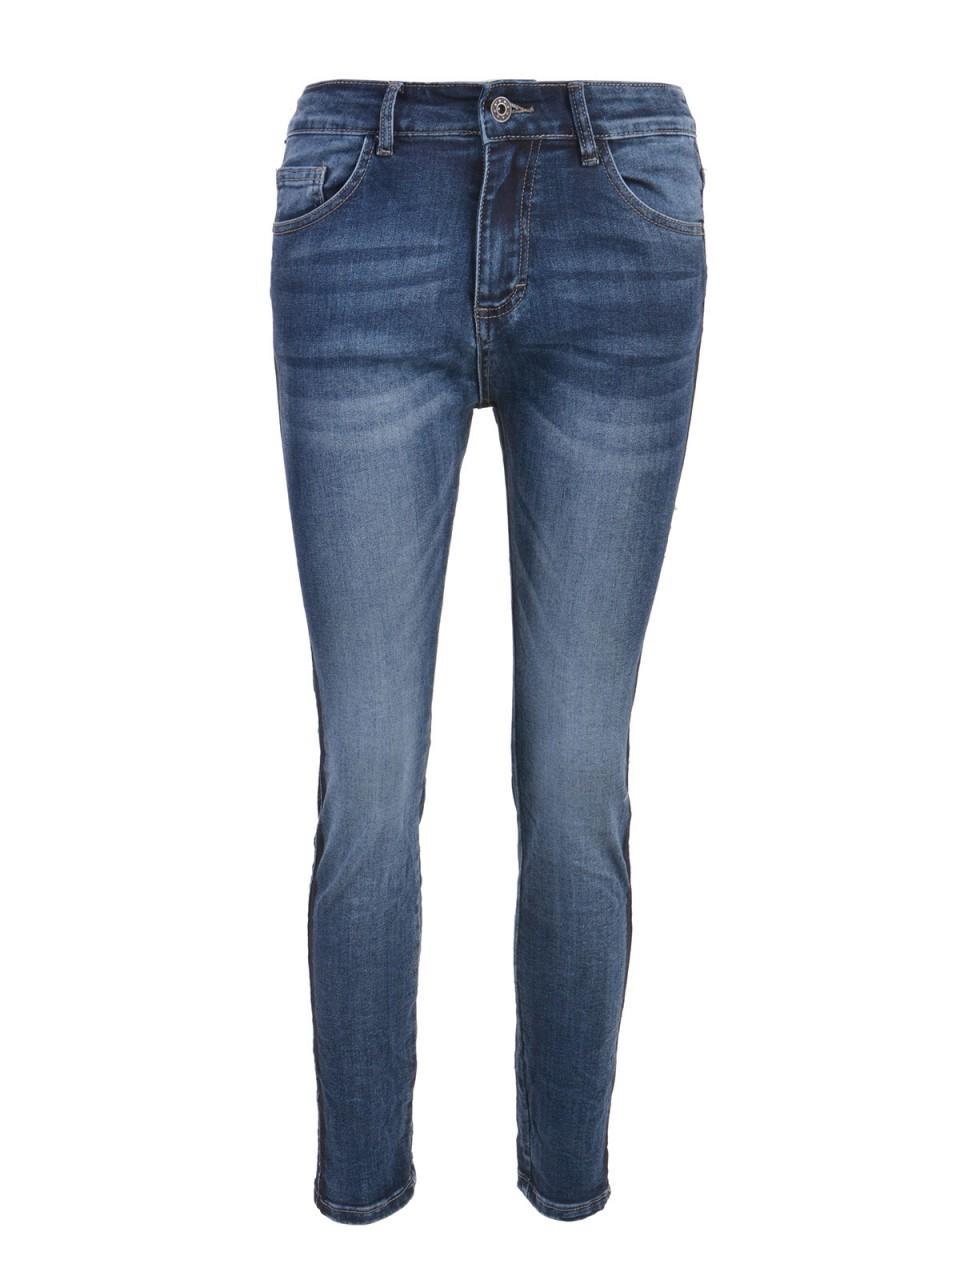 Hosen - SMITH SOUL Damen Jeans, blau  - Onlineshop Designermode.com